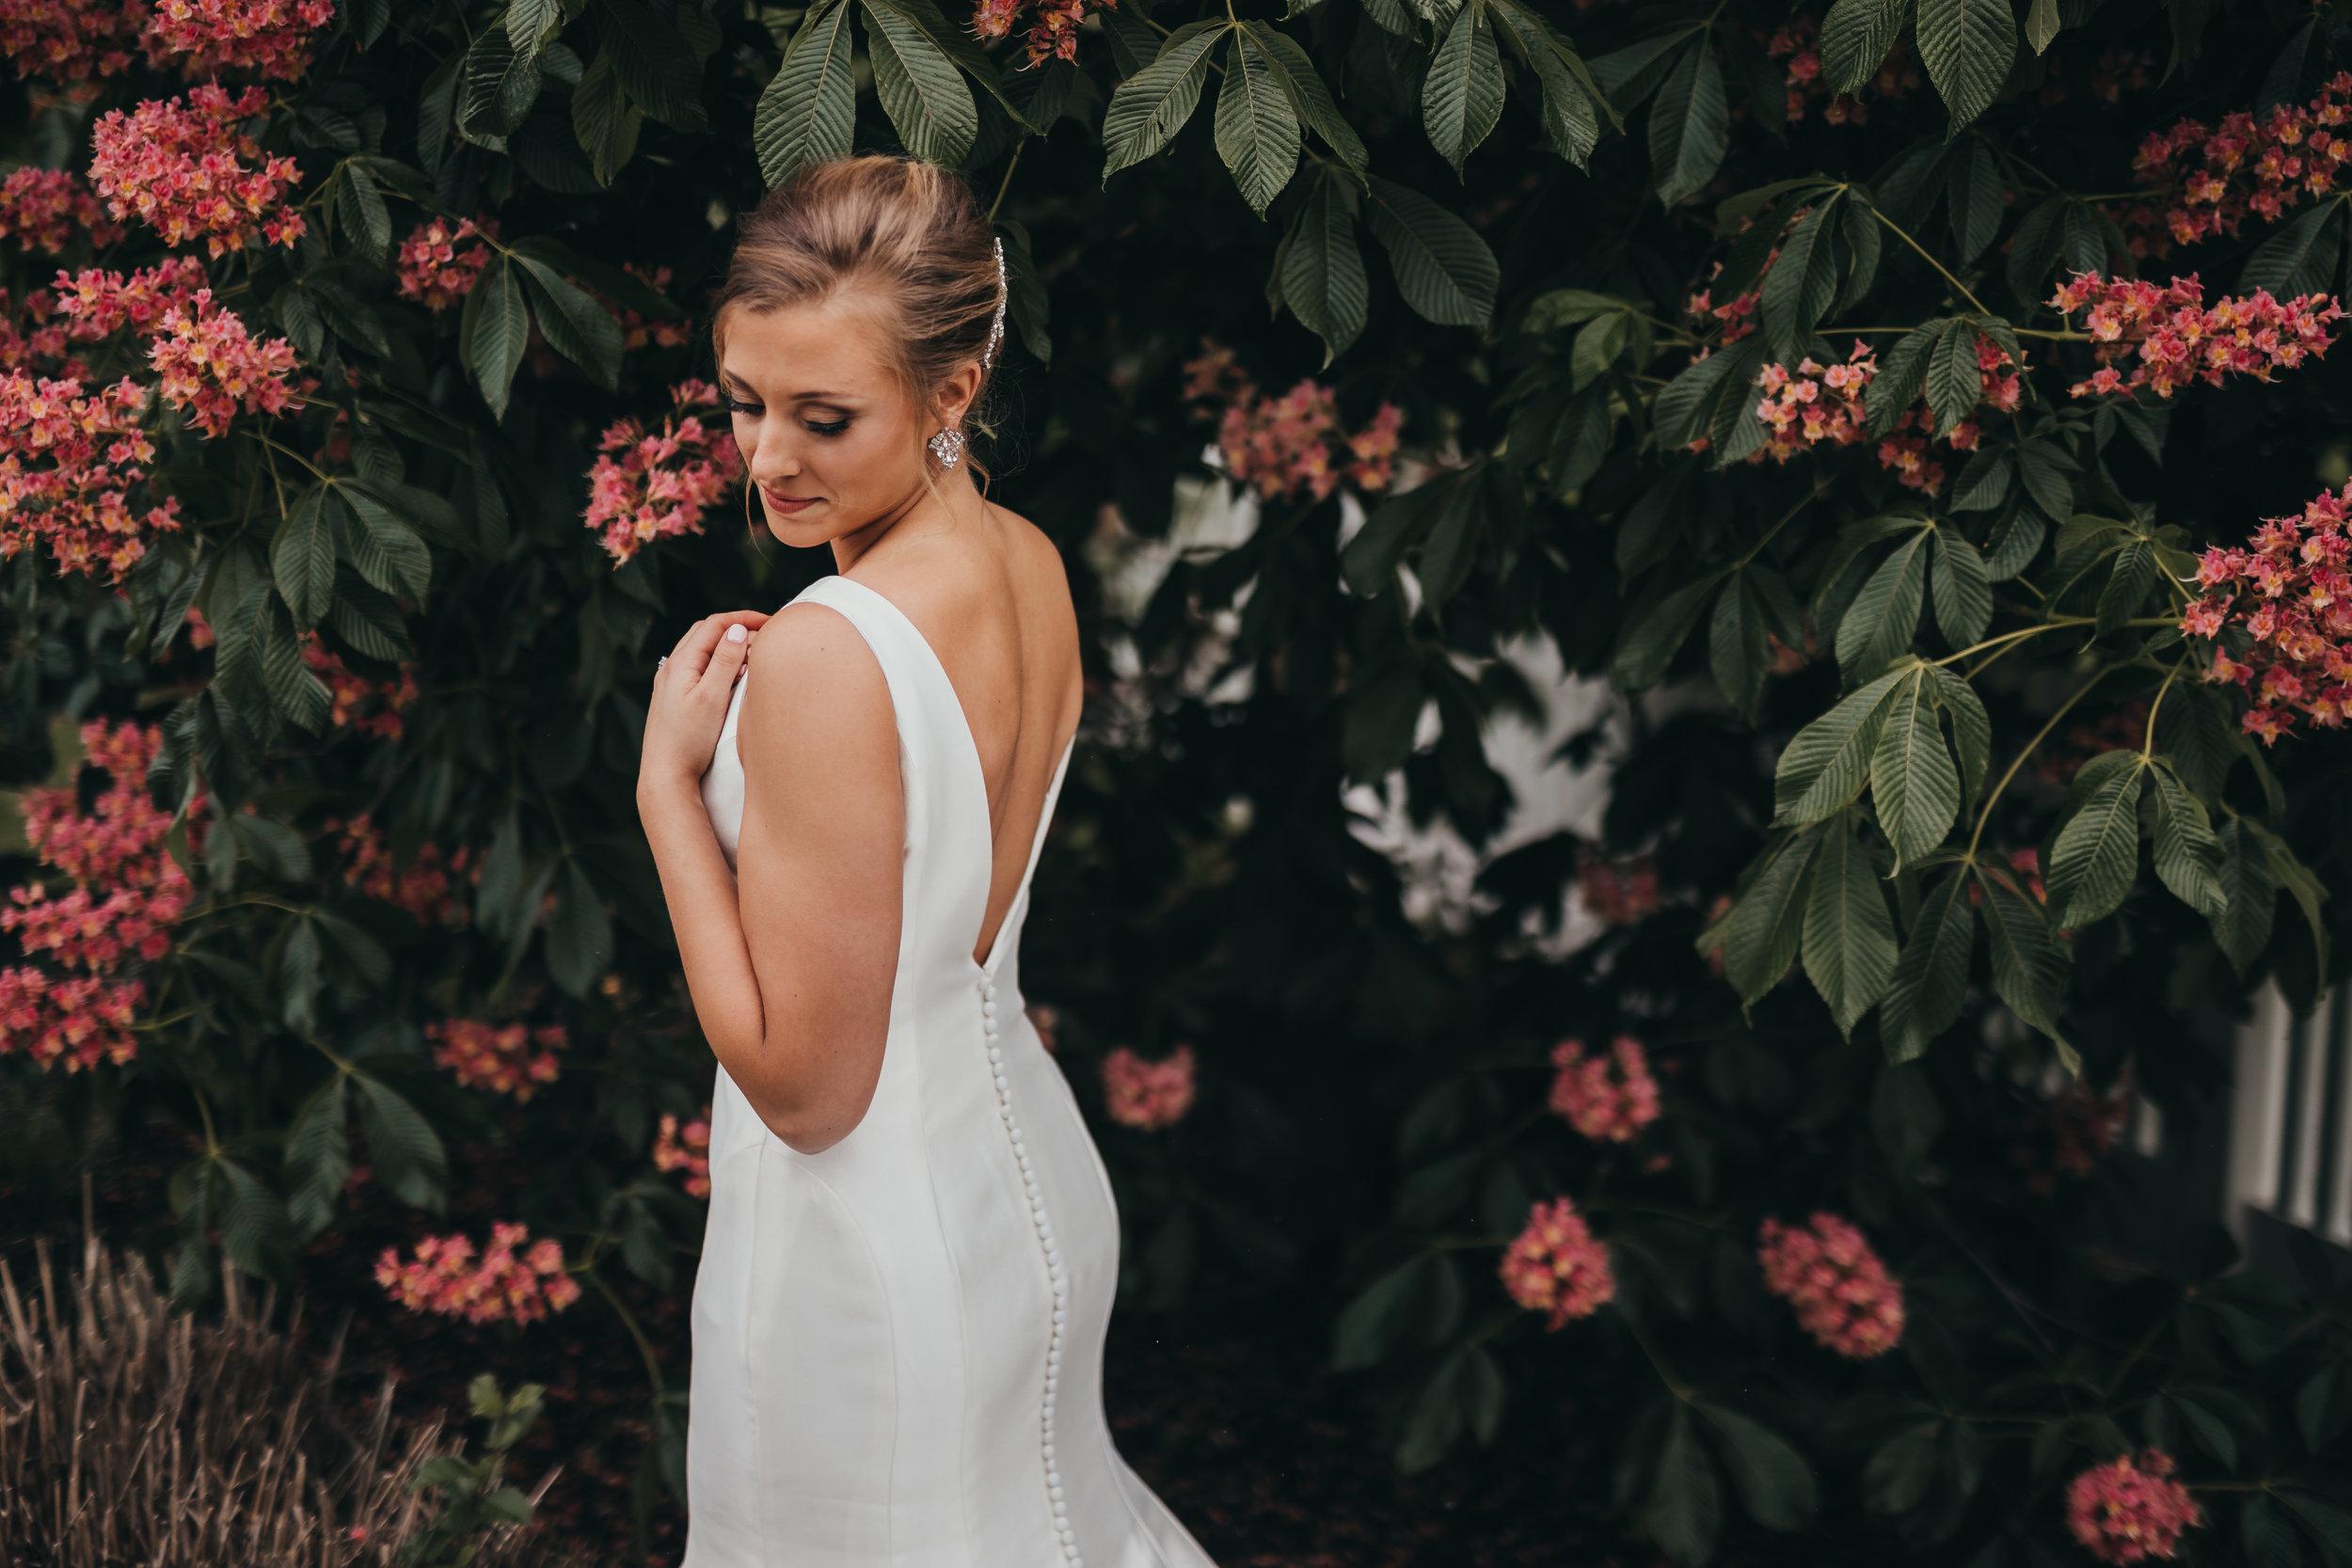 Centennial-Park-Munster-indiana-bride-and-groom-Lauren-ashley-studios-bride-pose.jpg